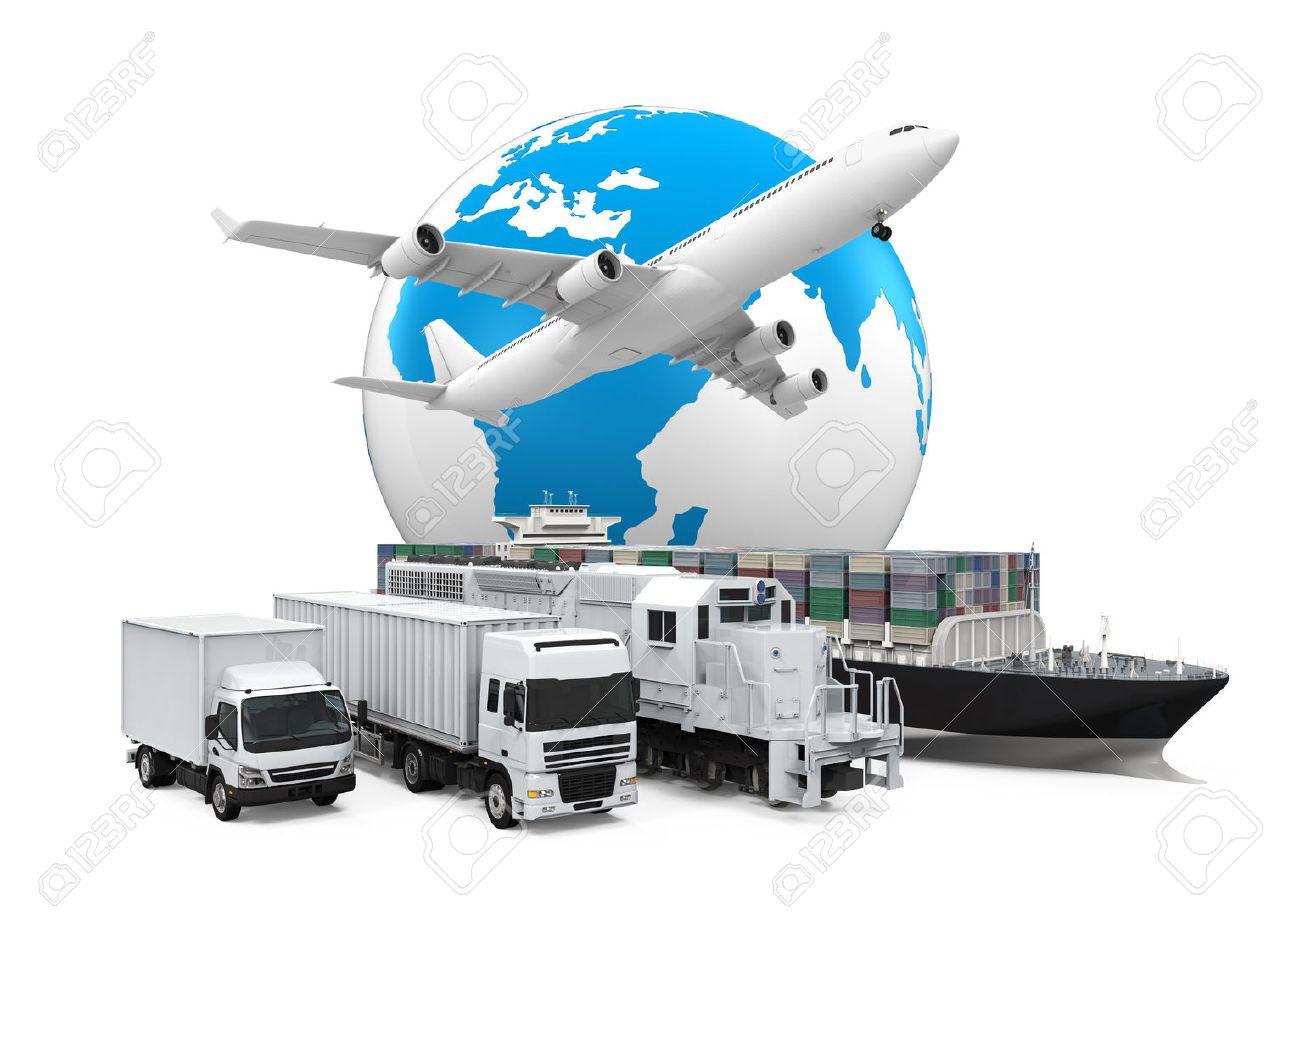 Resultado de imagen para transporte